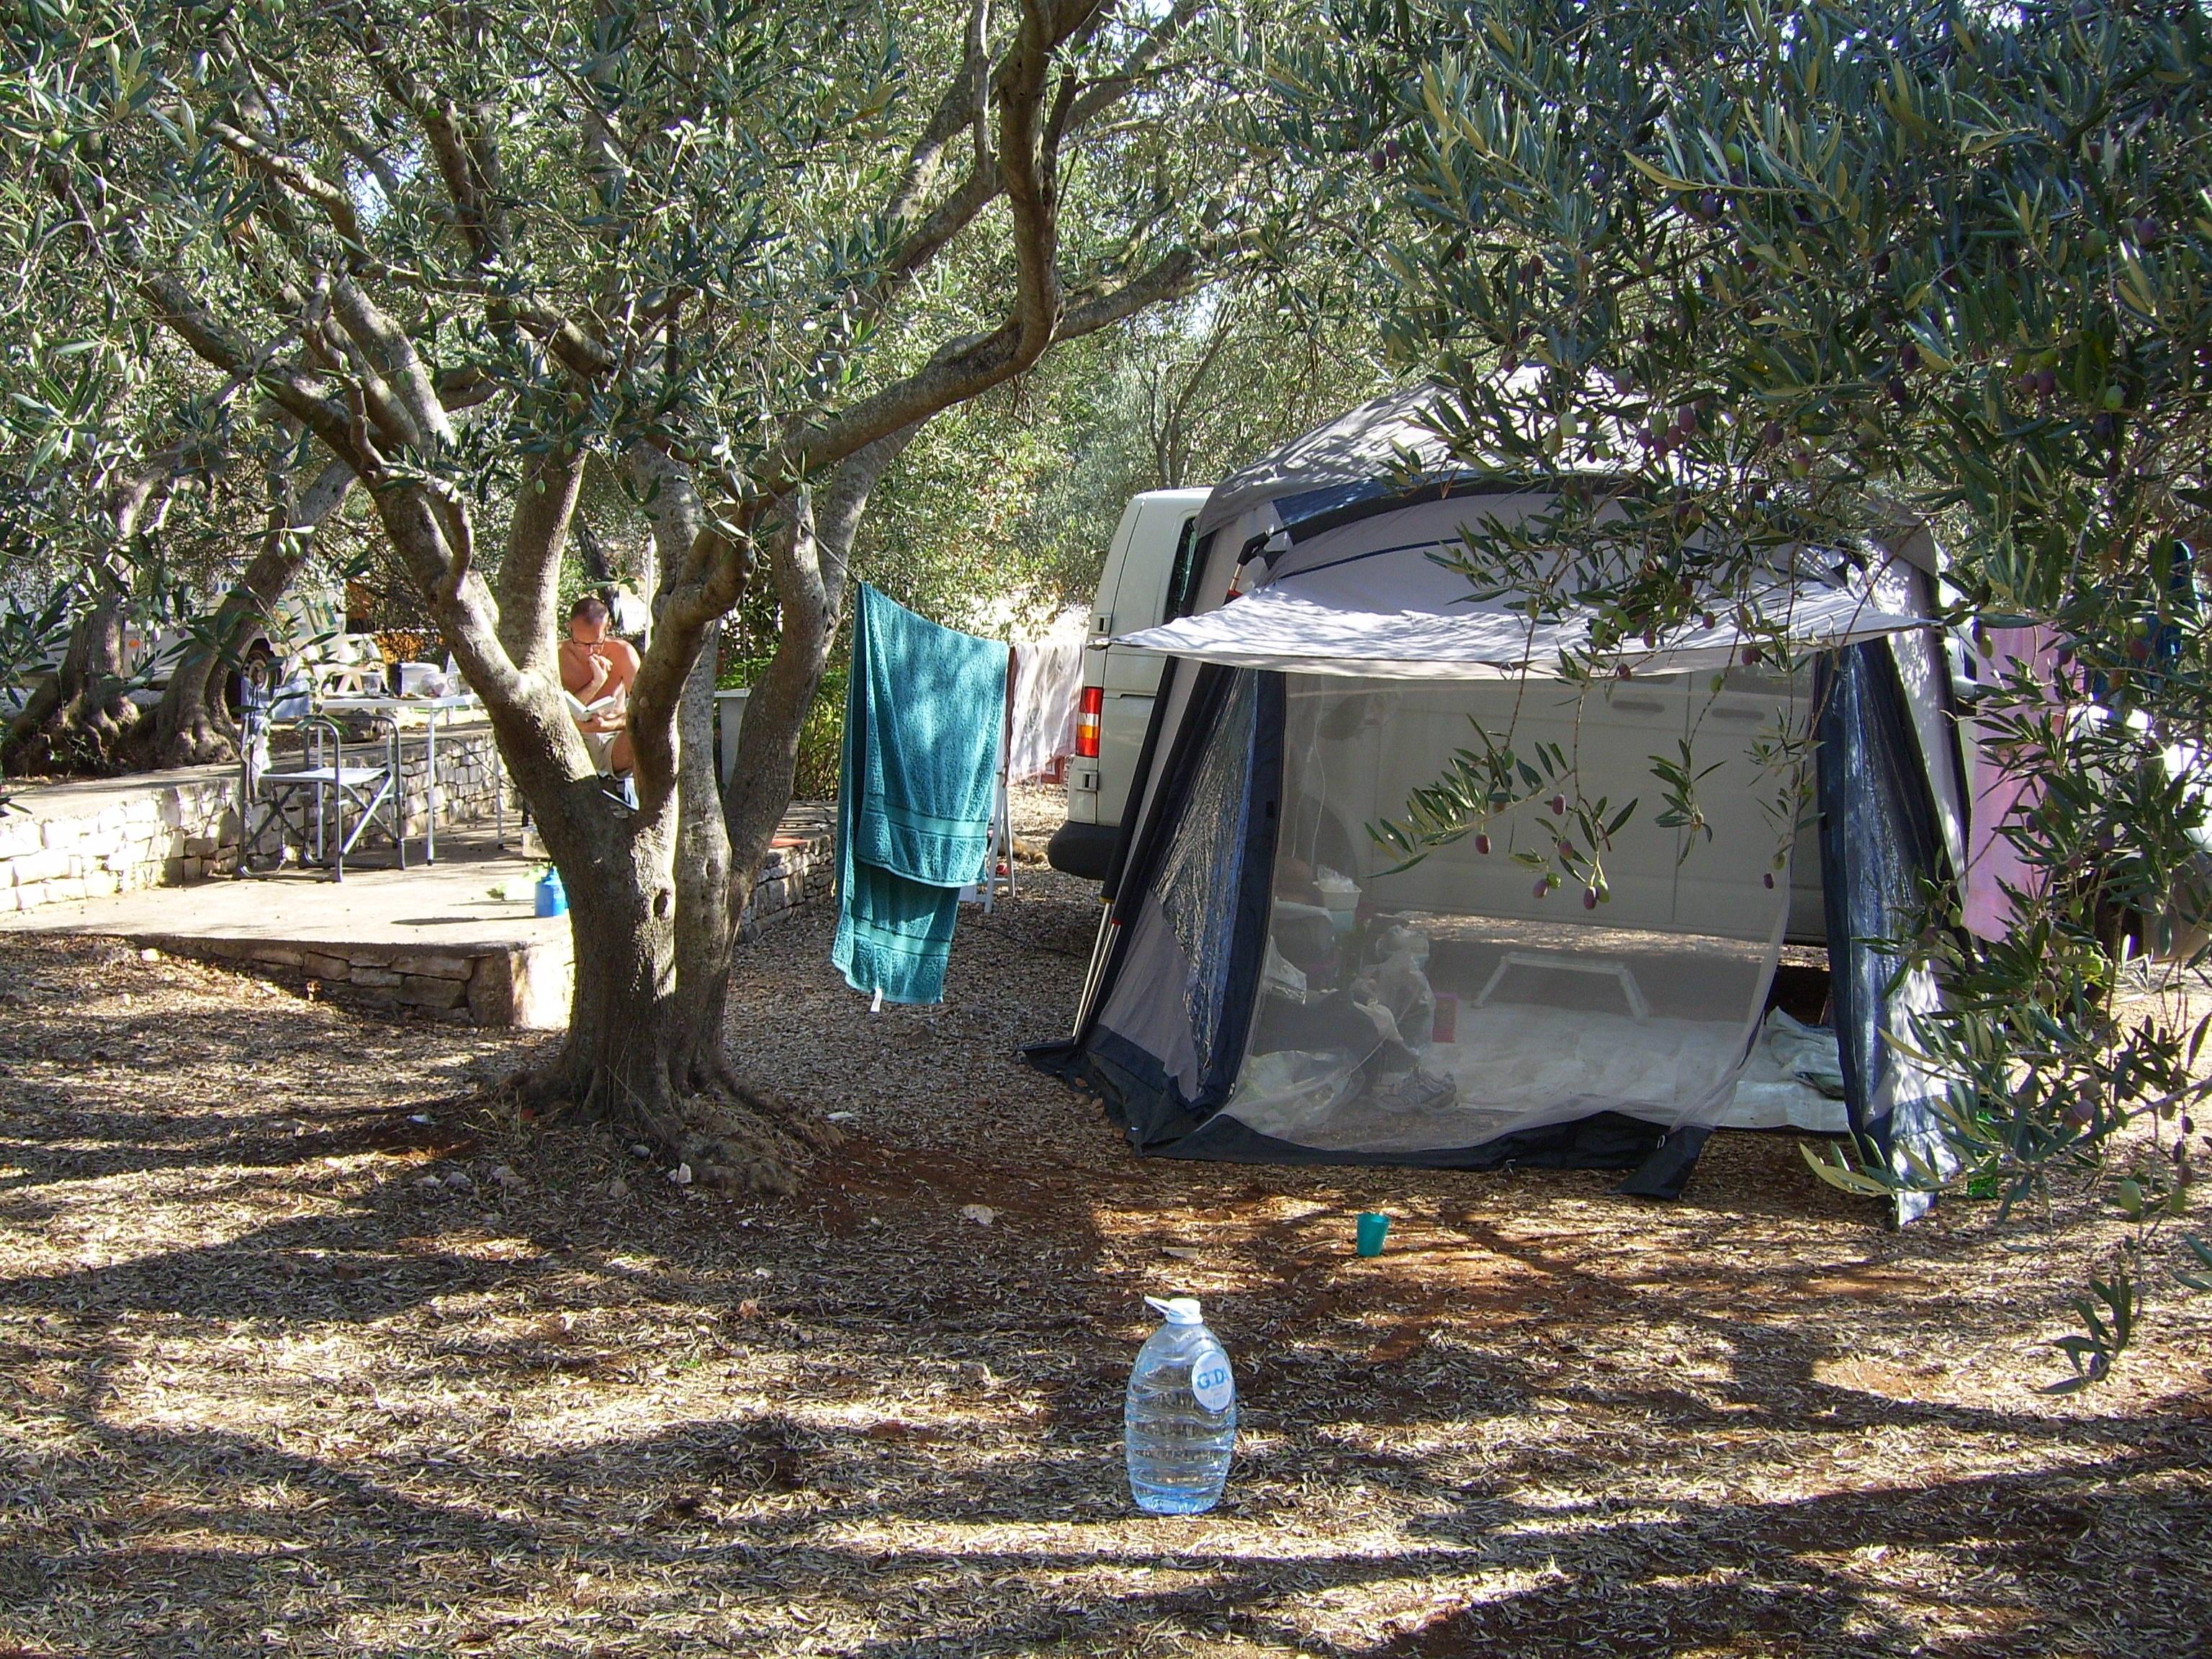 beach tree community holiday rest c&ing tent holidays c&ing holidays & Free Images : beach tree community holiday rest tent camping ...